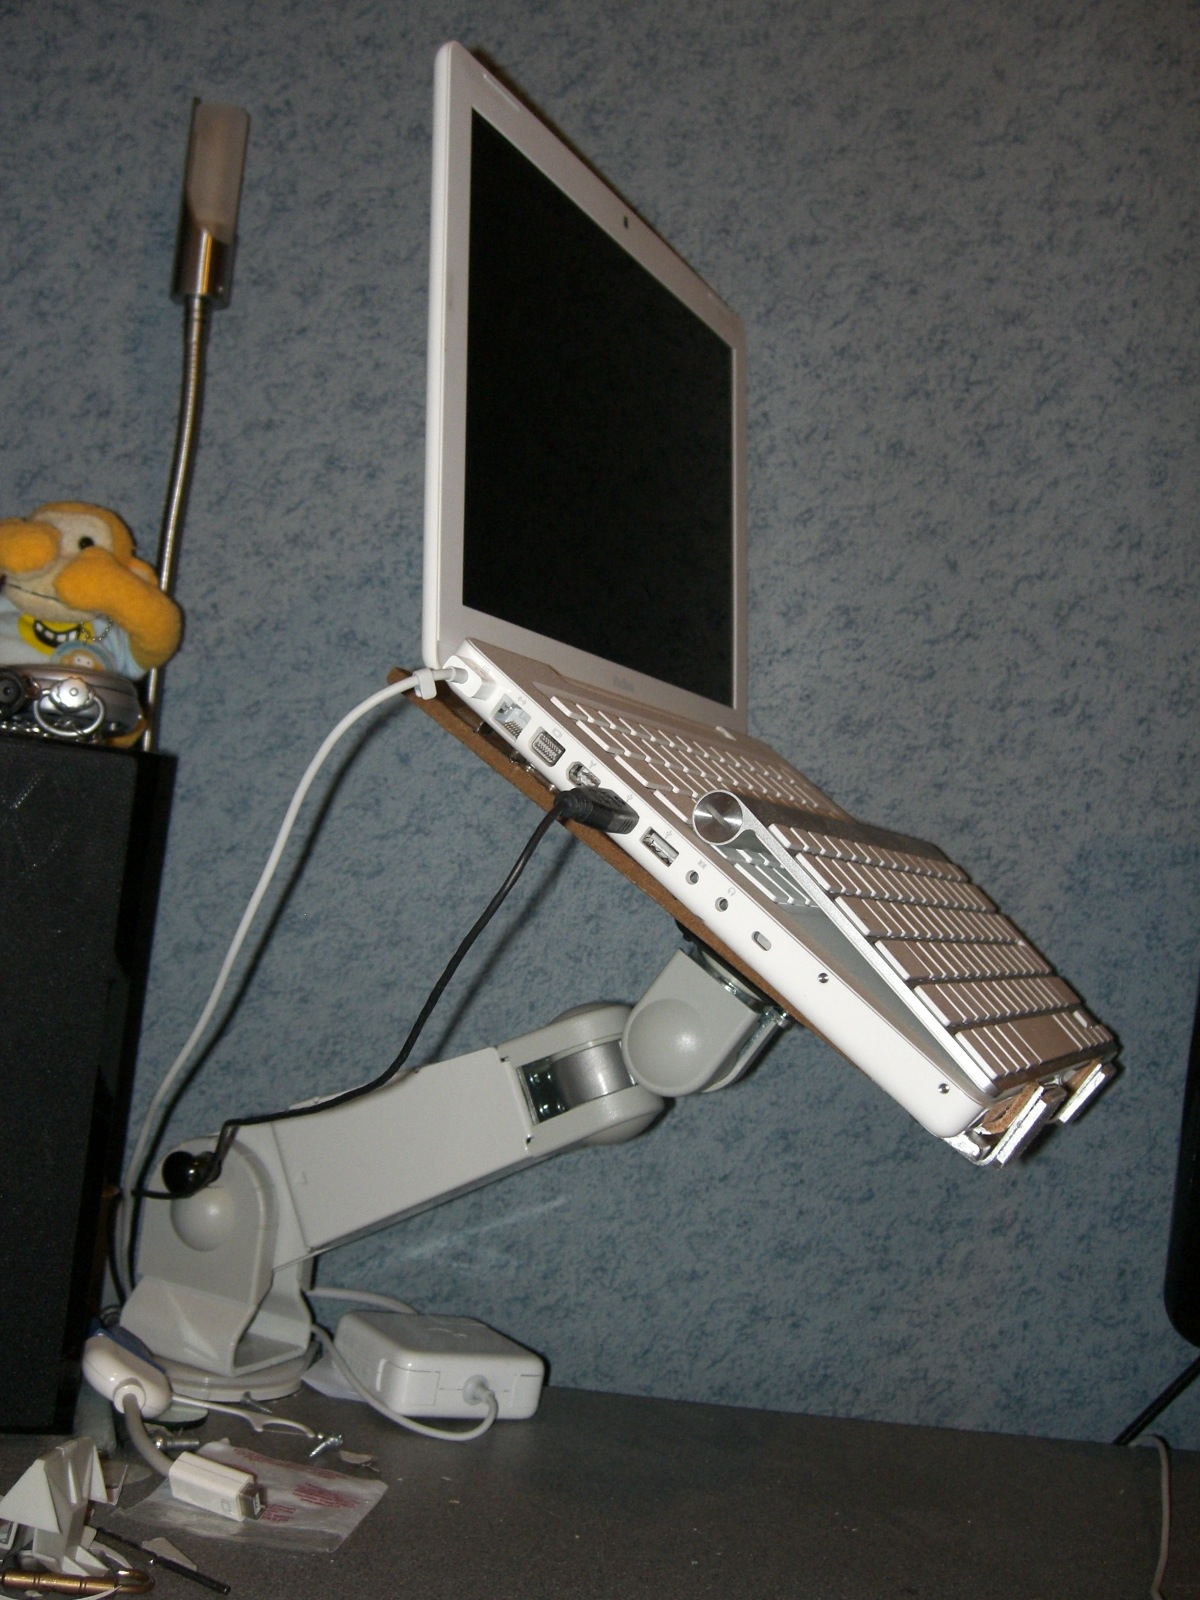 Picture of Adjustable Vesa Arm Laptop Stand